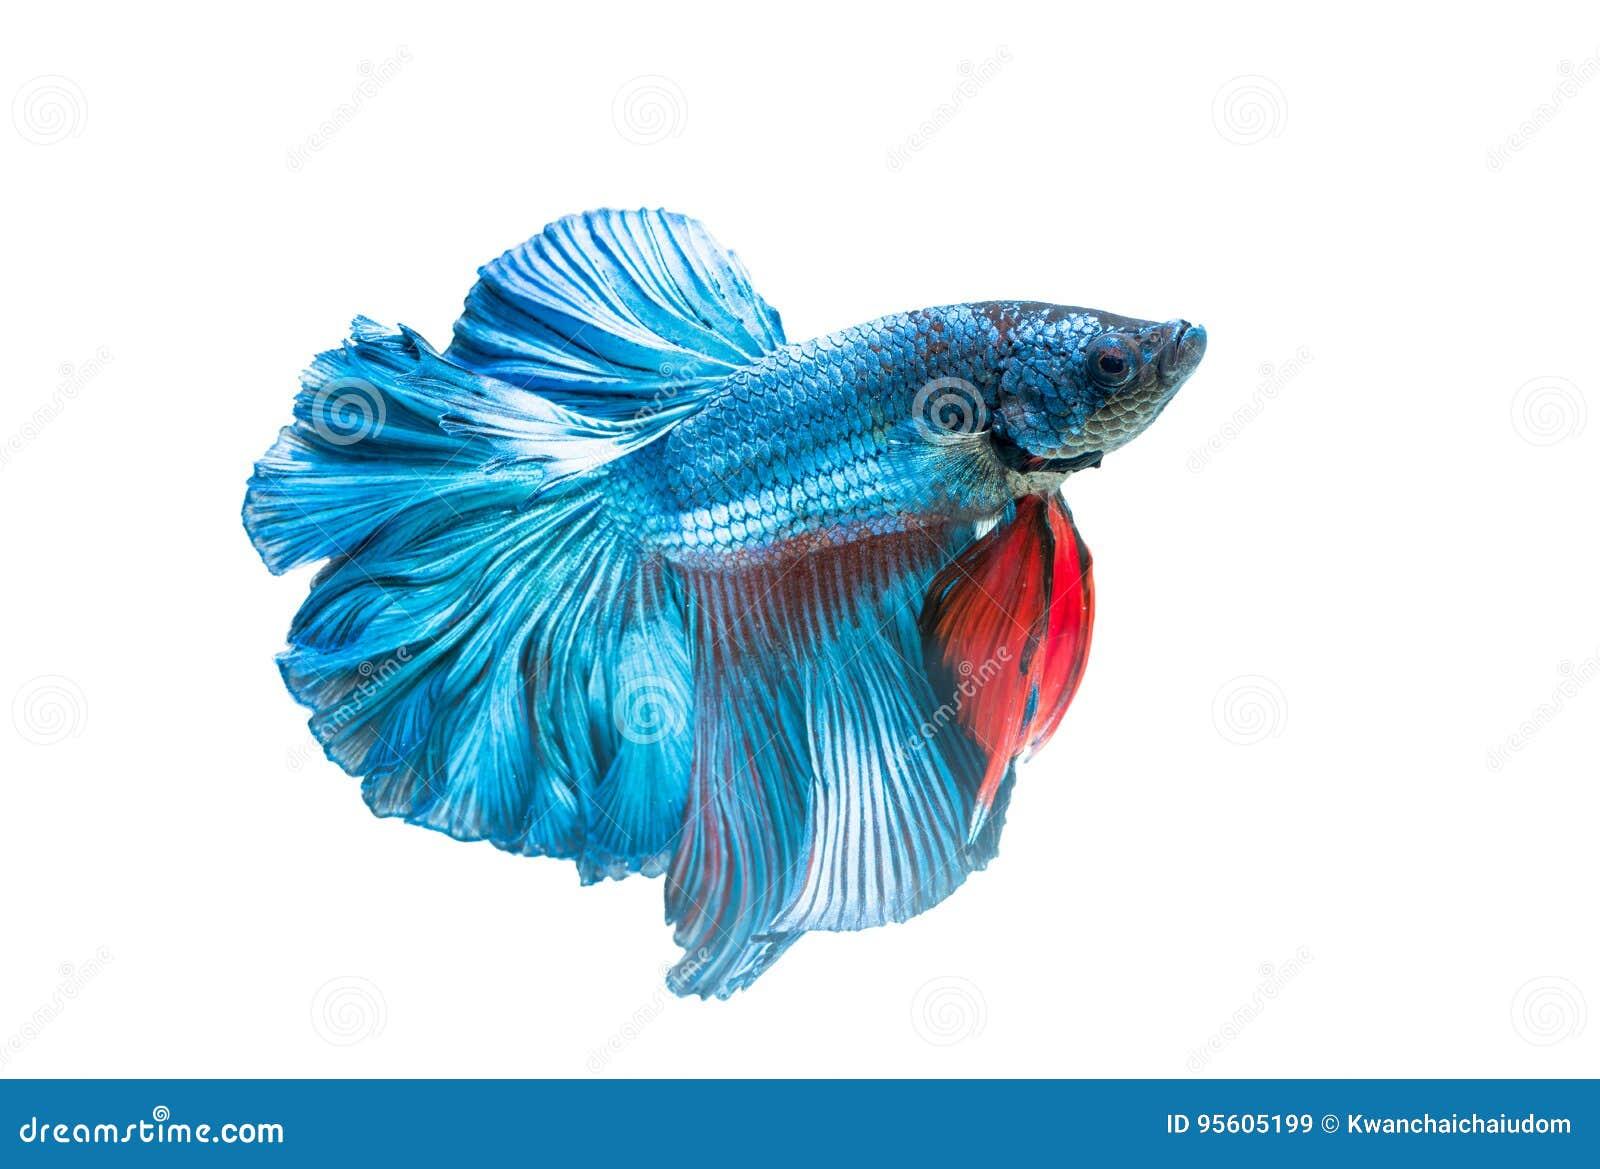 Siamese fighting fish, betta splendens isolated